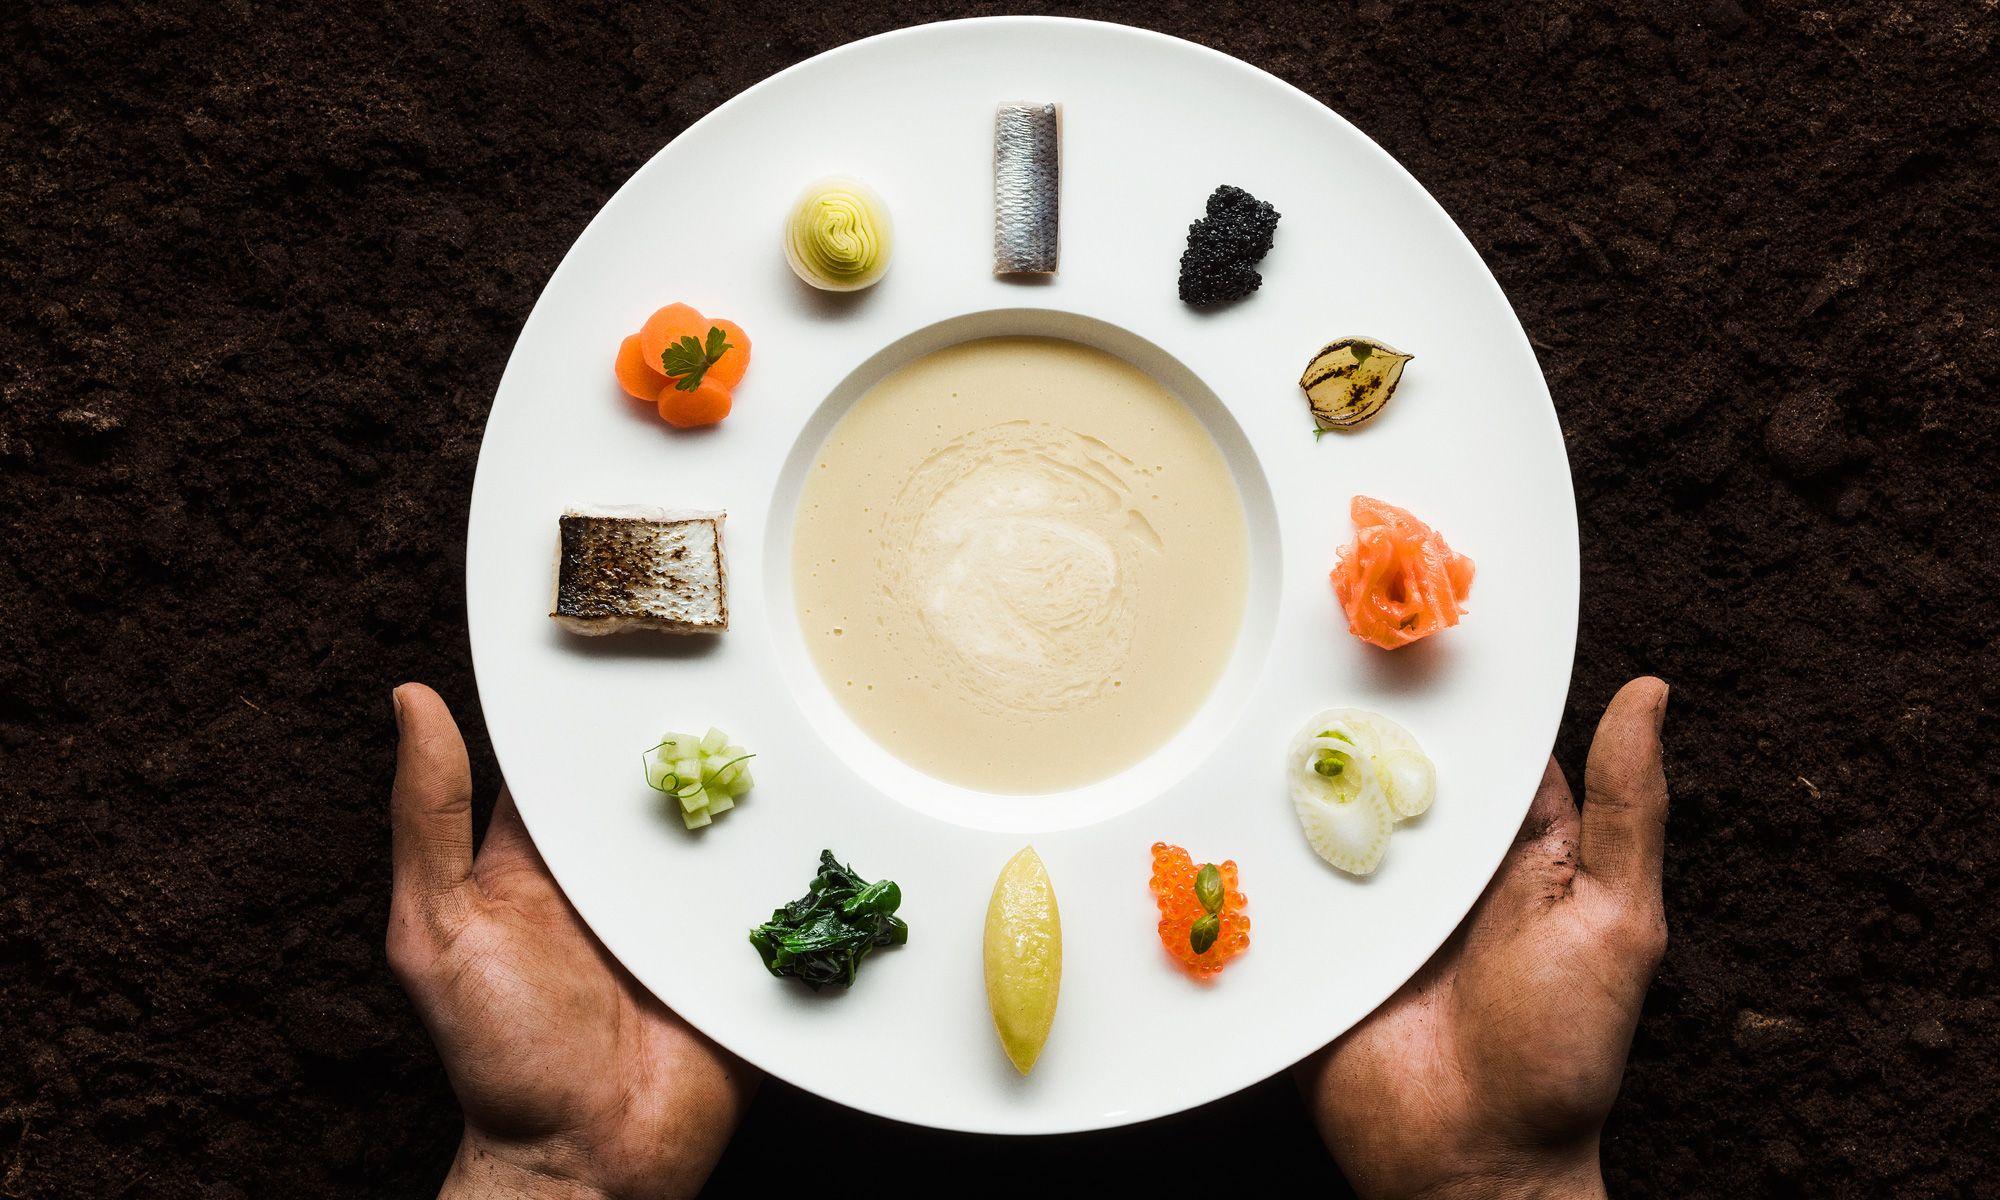 Test Kitchen Welcomes Finnish Chef Jouni Toivanen This April